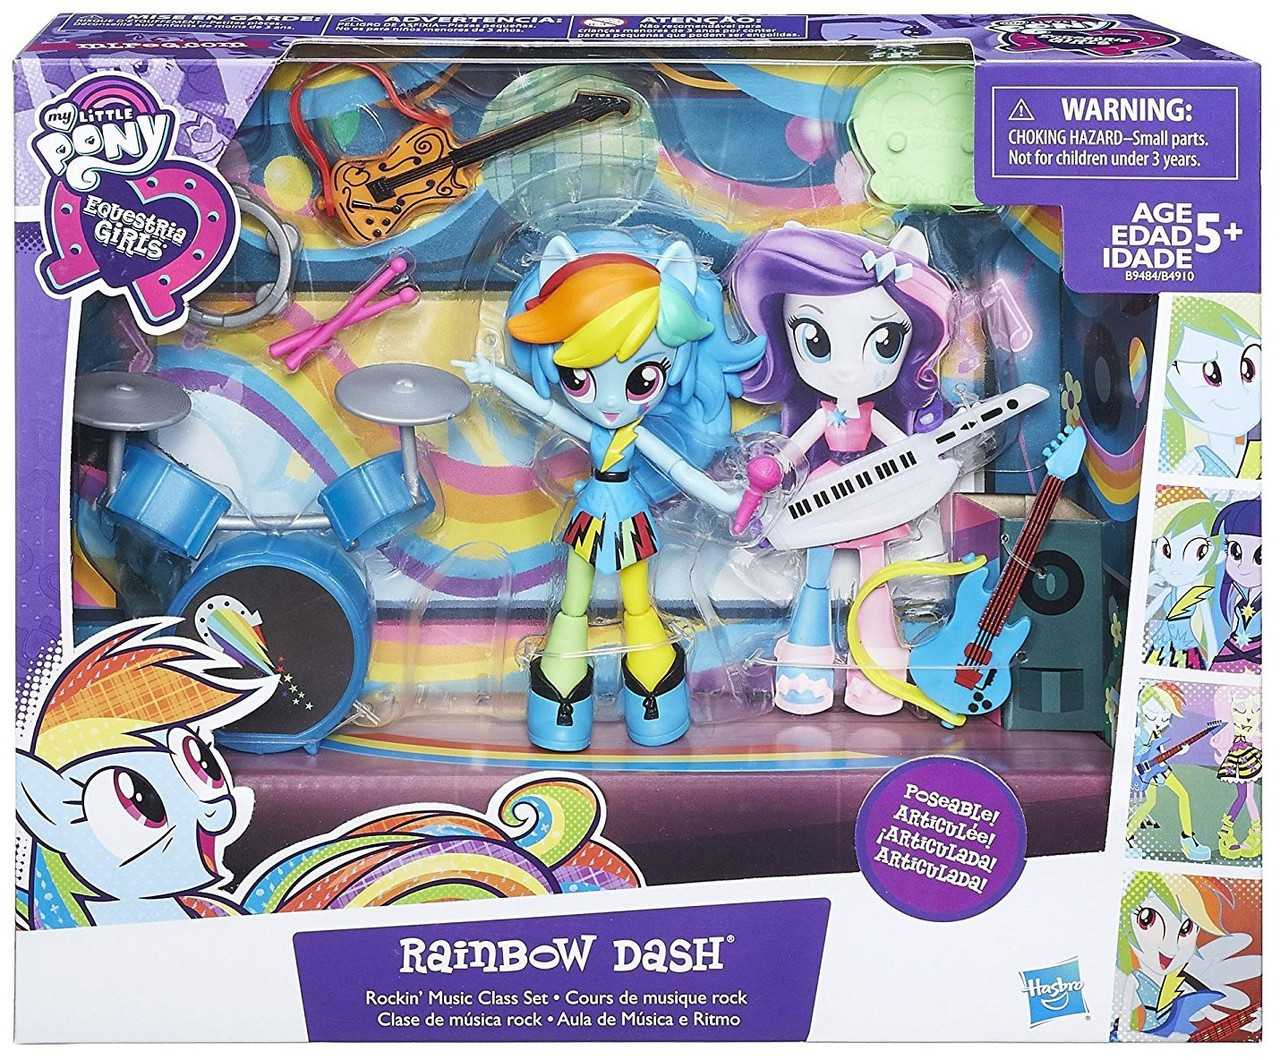 ad3be180791 My Little Pony Equestria Girls Minis Rainbow Dash Music Class Figure Set  Hasbro Toys - ToyWiz